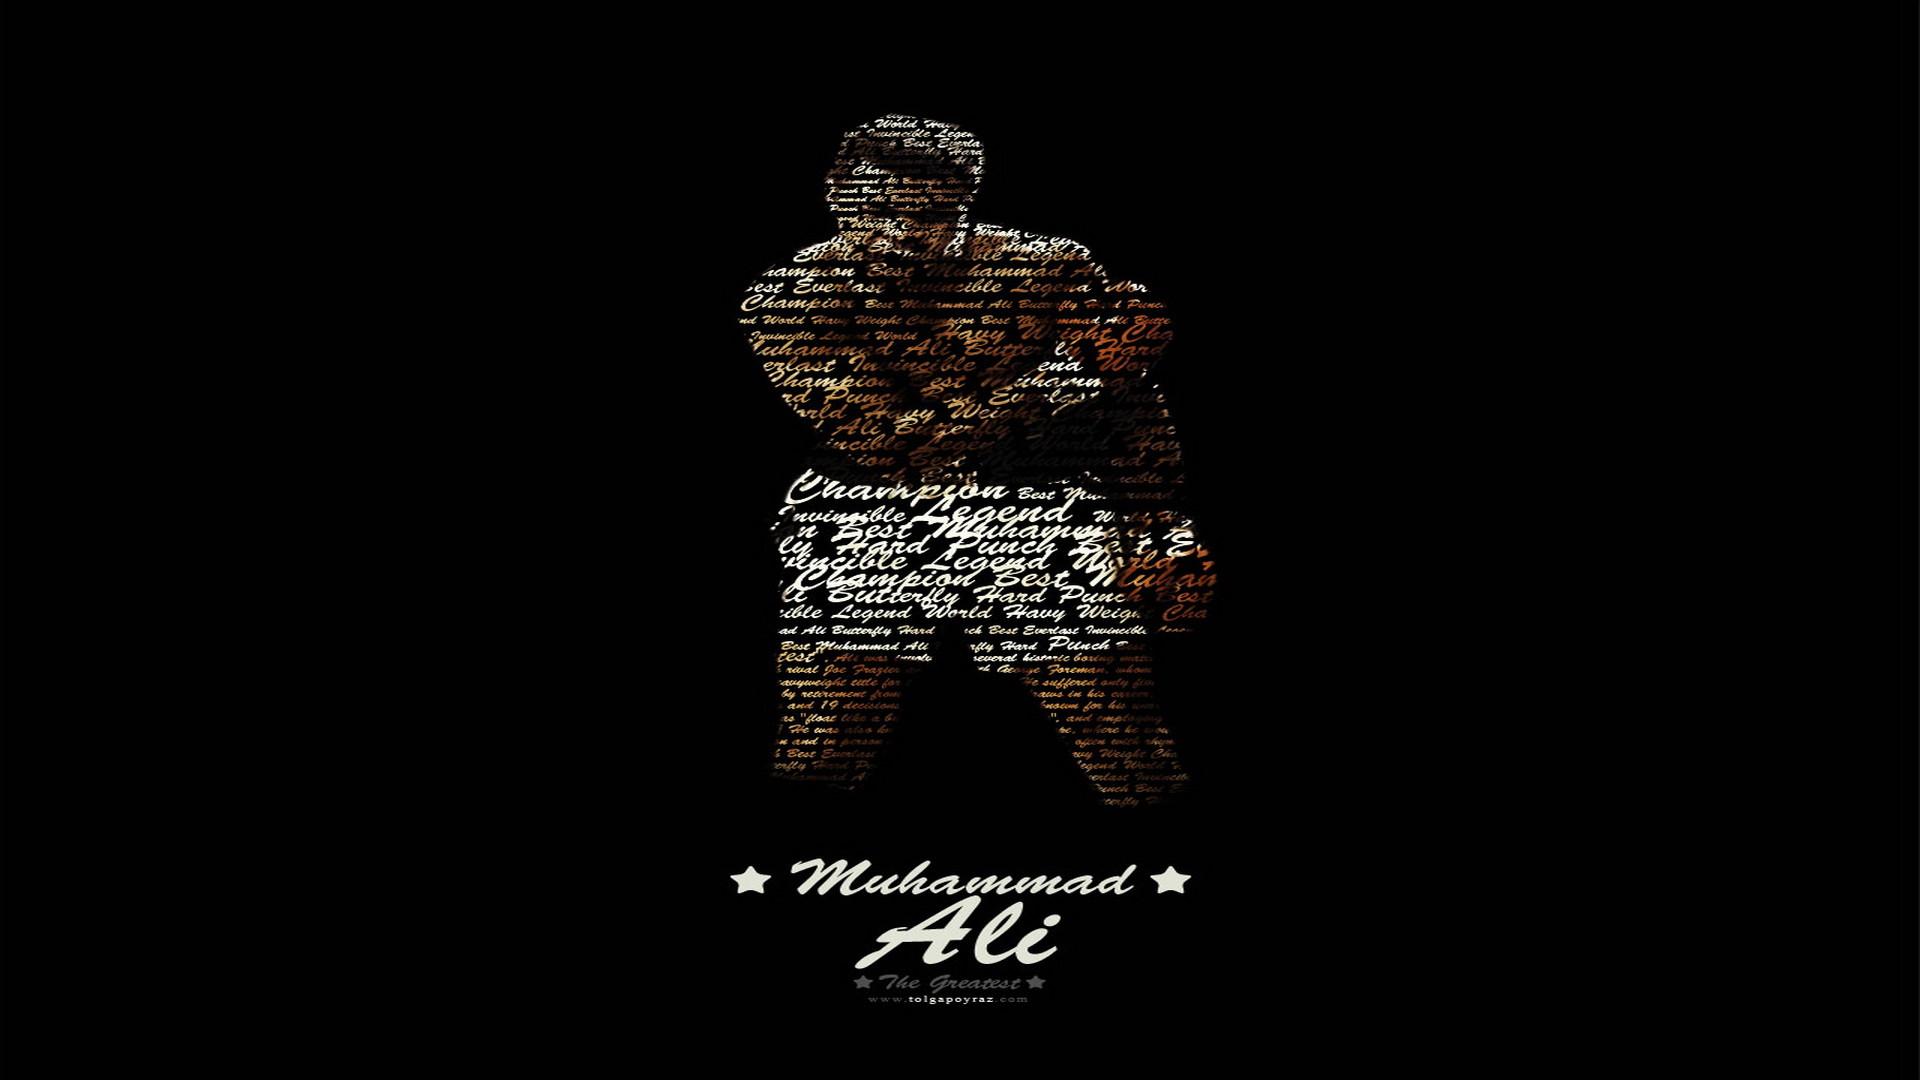 Muhammad Ali Wallpapers 17 | HD Desktop Wallpapers